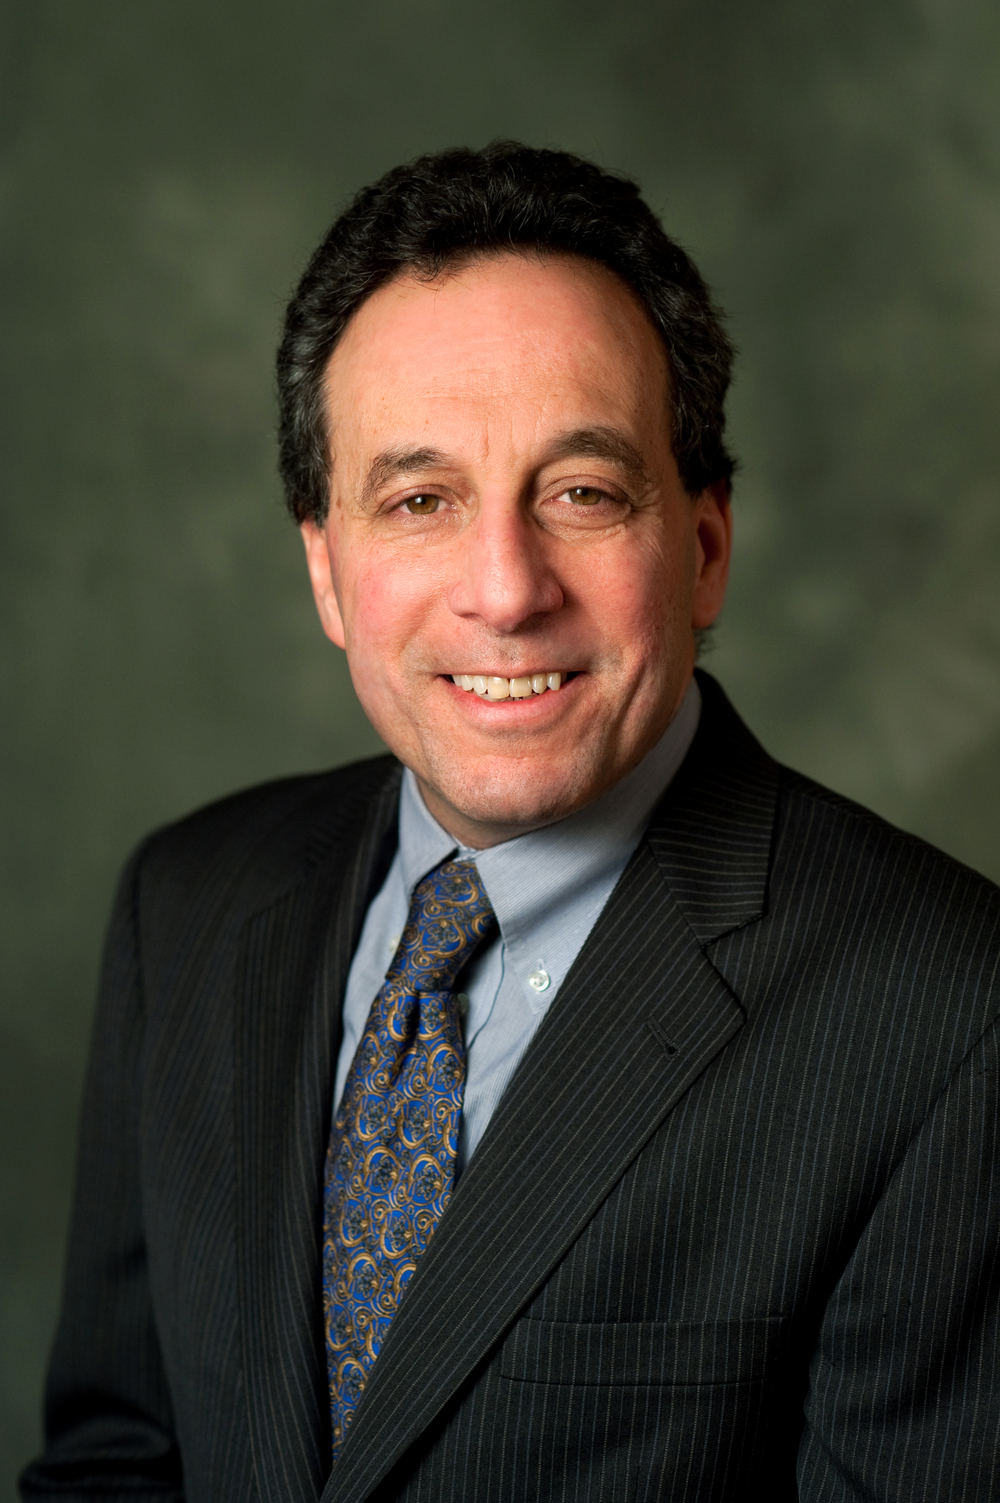 Kenneth Bandler